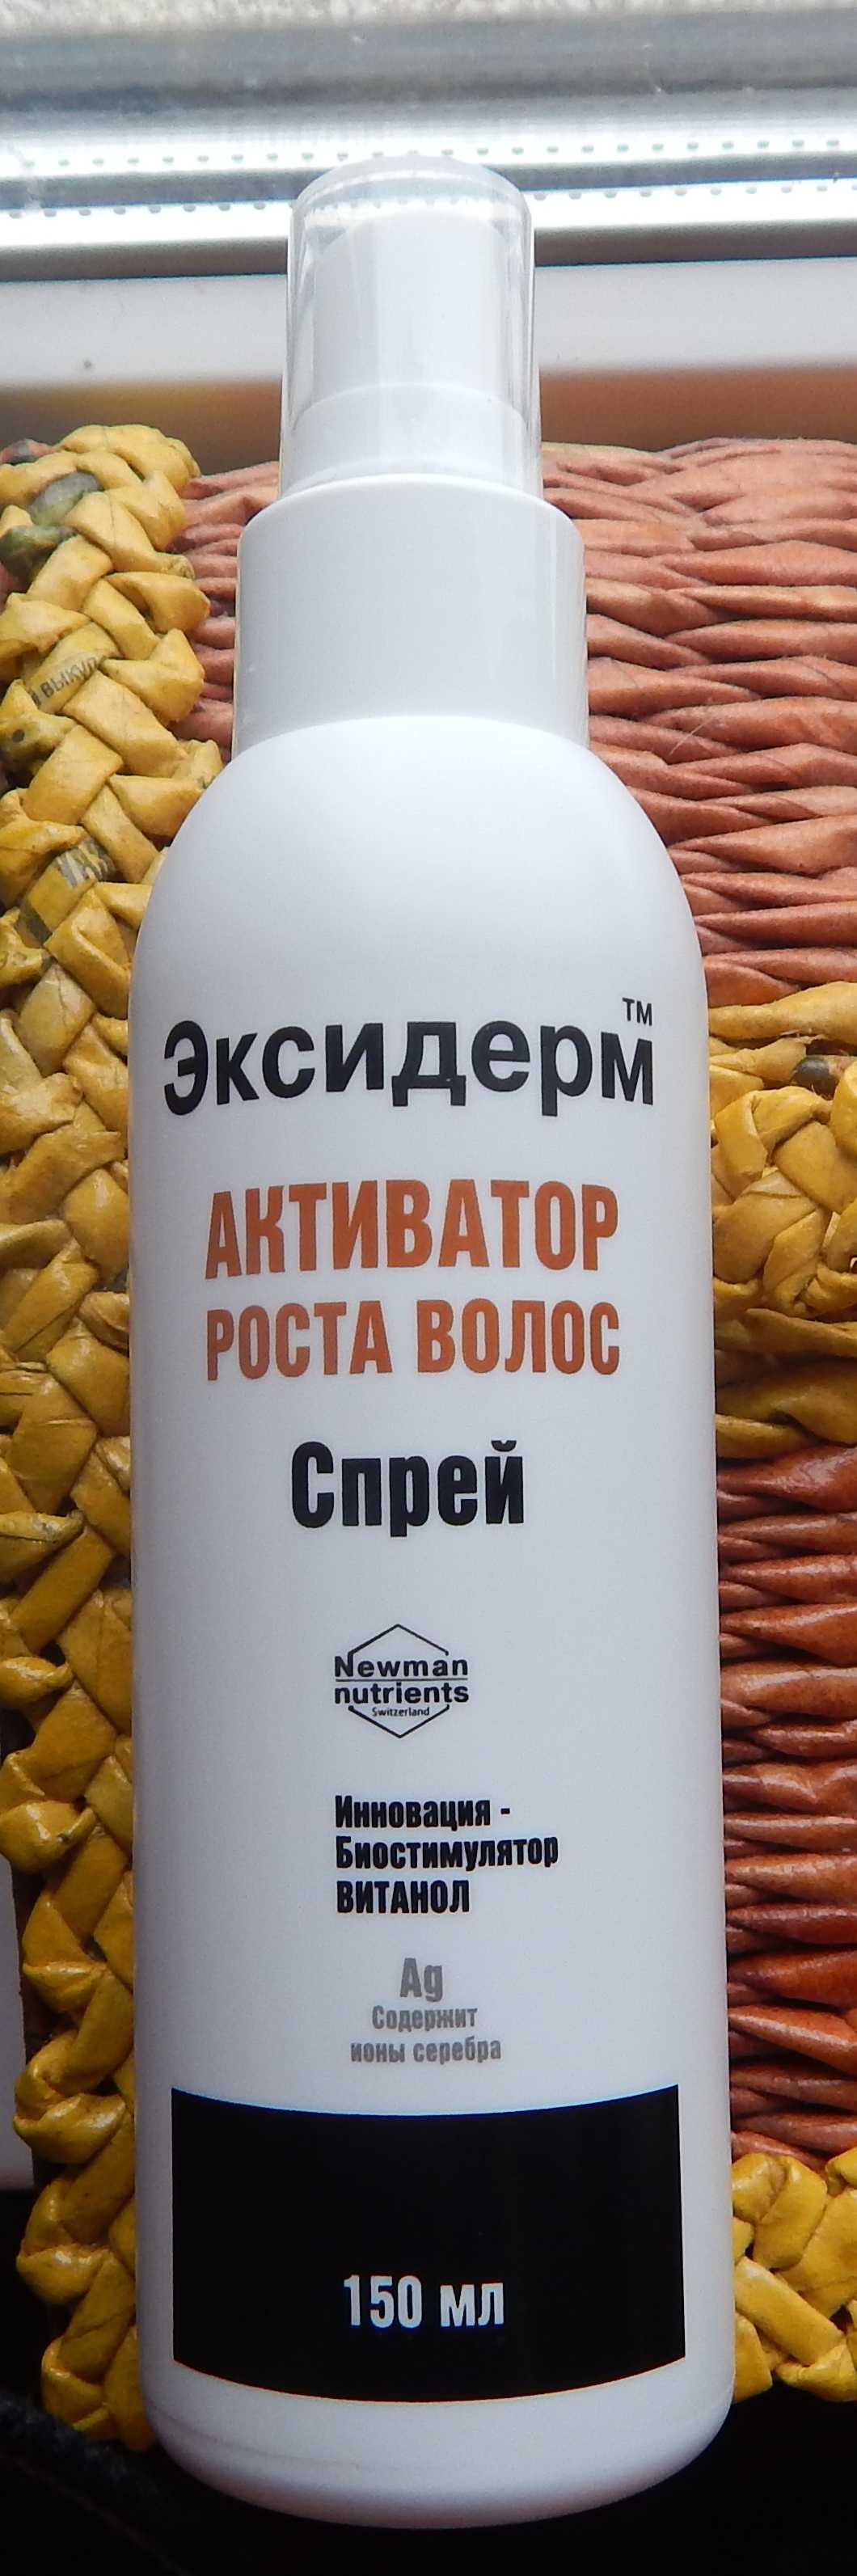 http://images.spasibovsem.ru/catalog/original/sprej-dlya-volos-eksiderm-aktivator-rosta-volos-korolyovfarm-1477728307.jpg